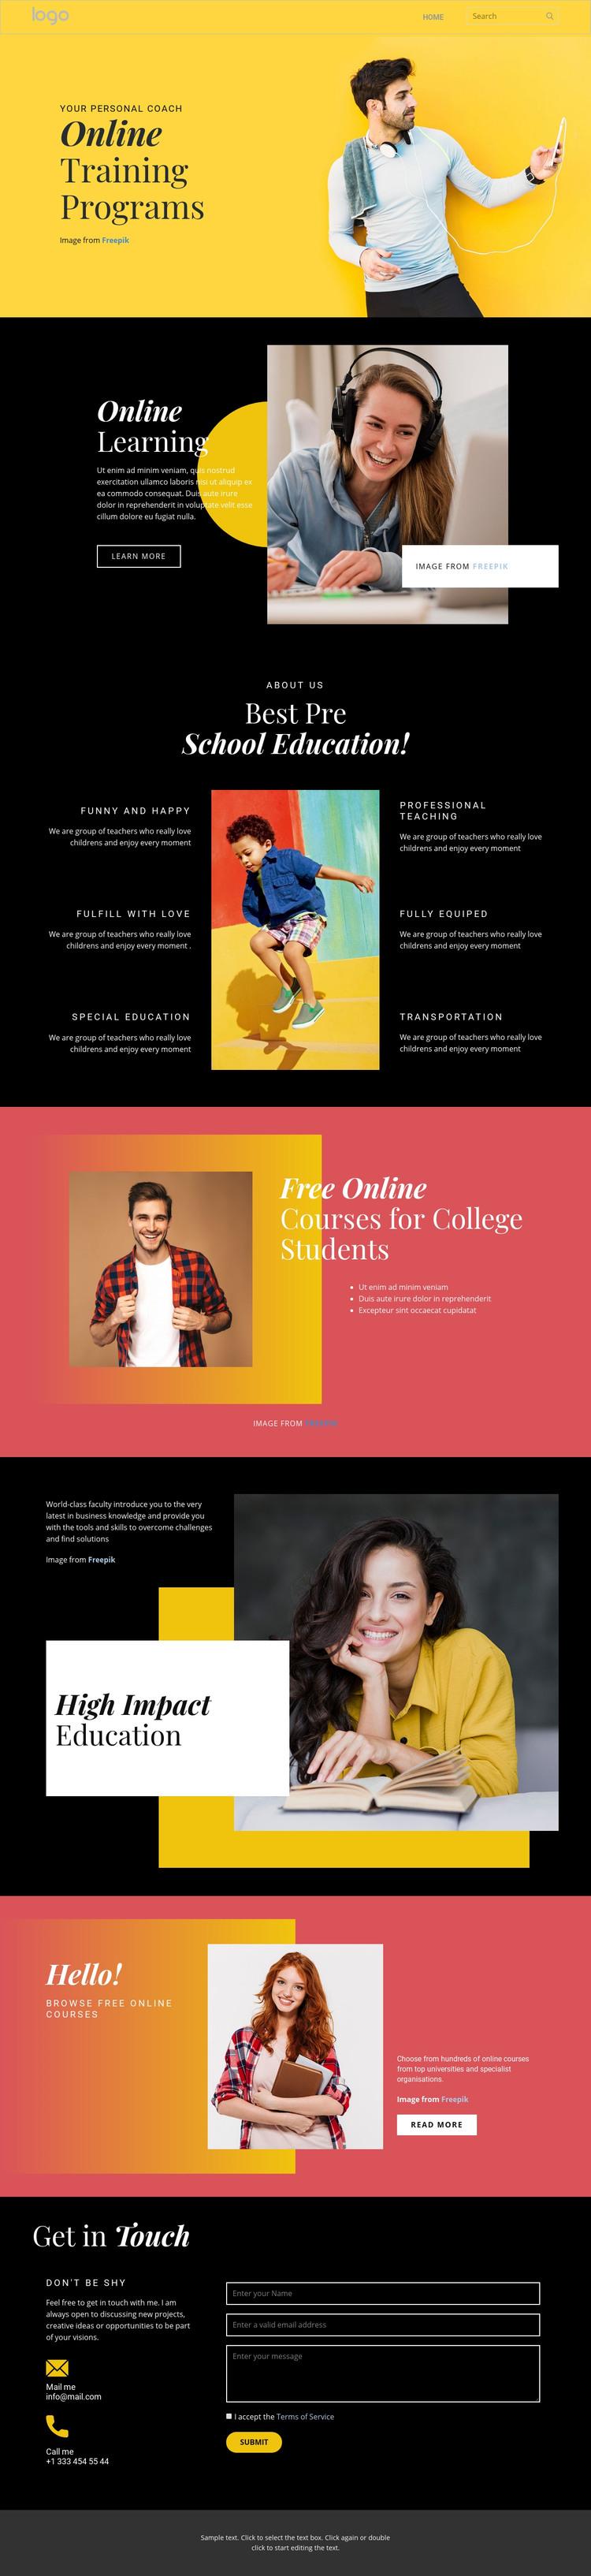 Good online education Homepage Design